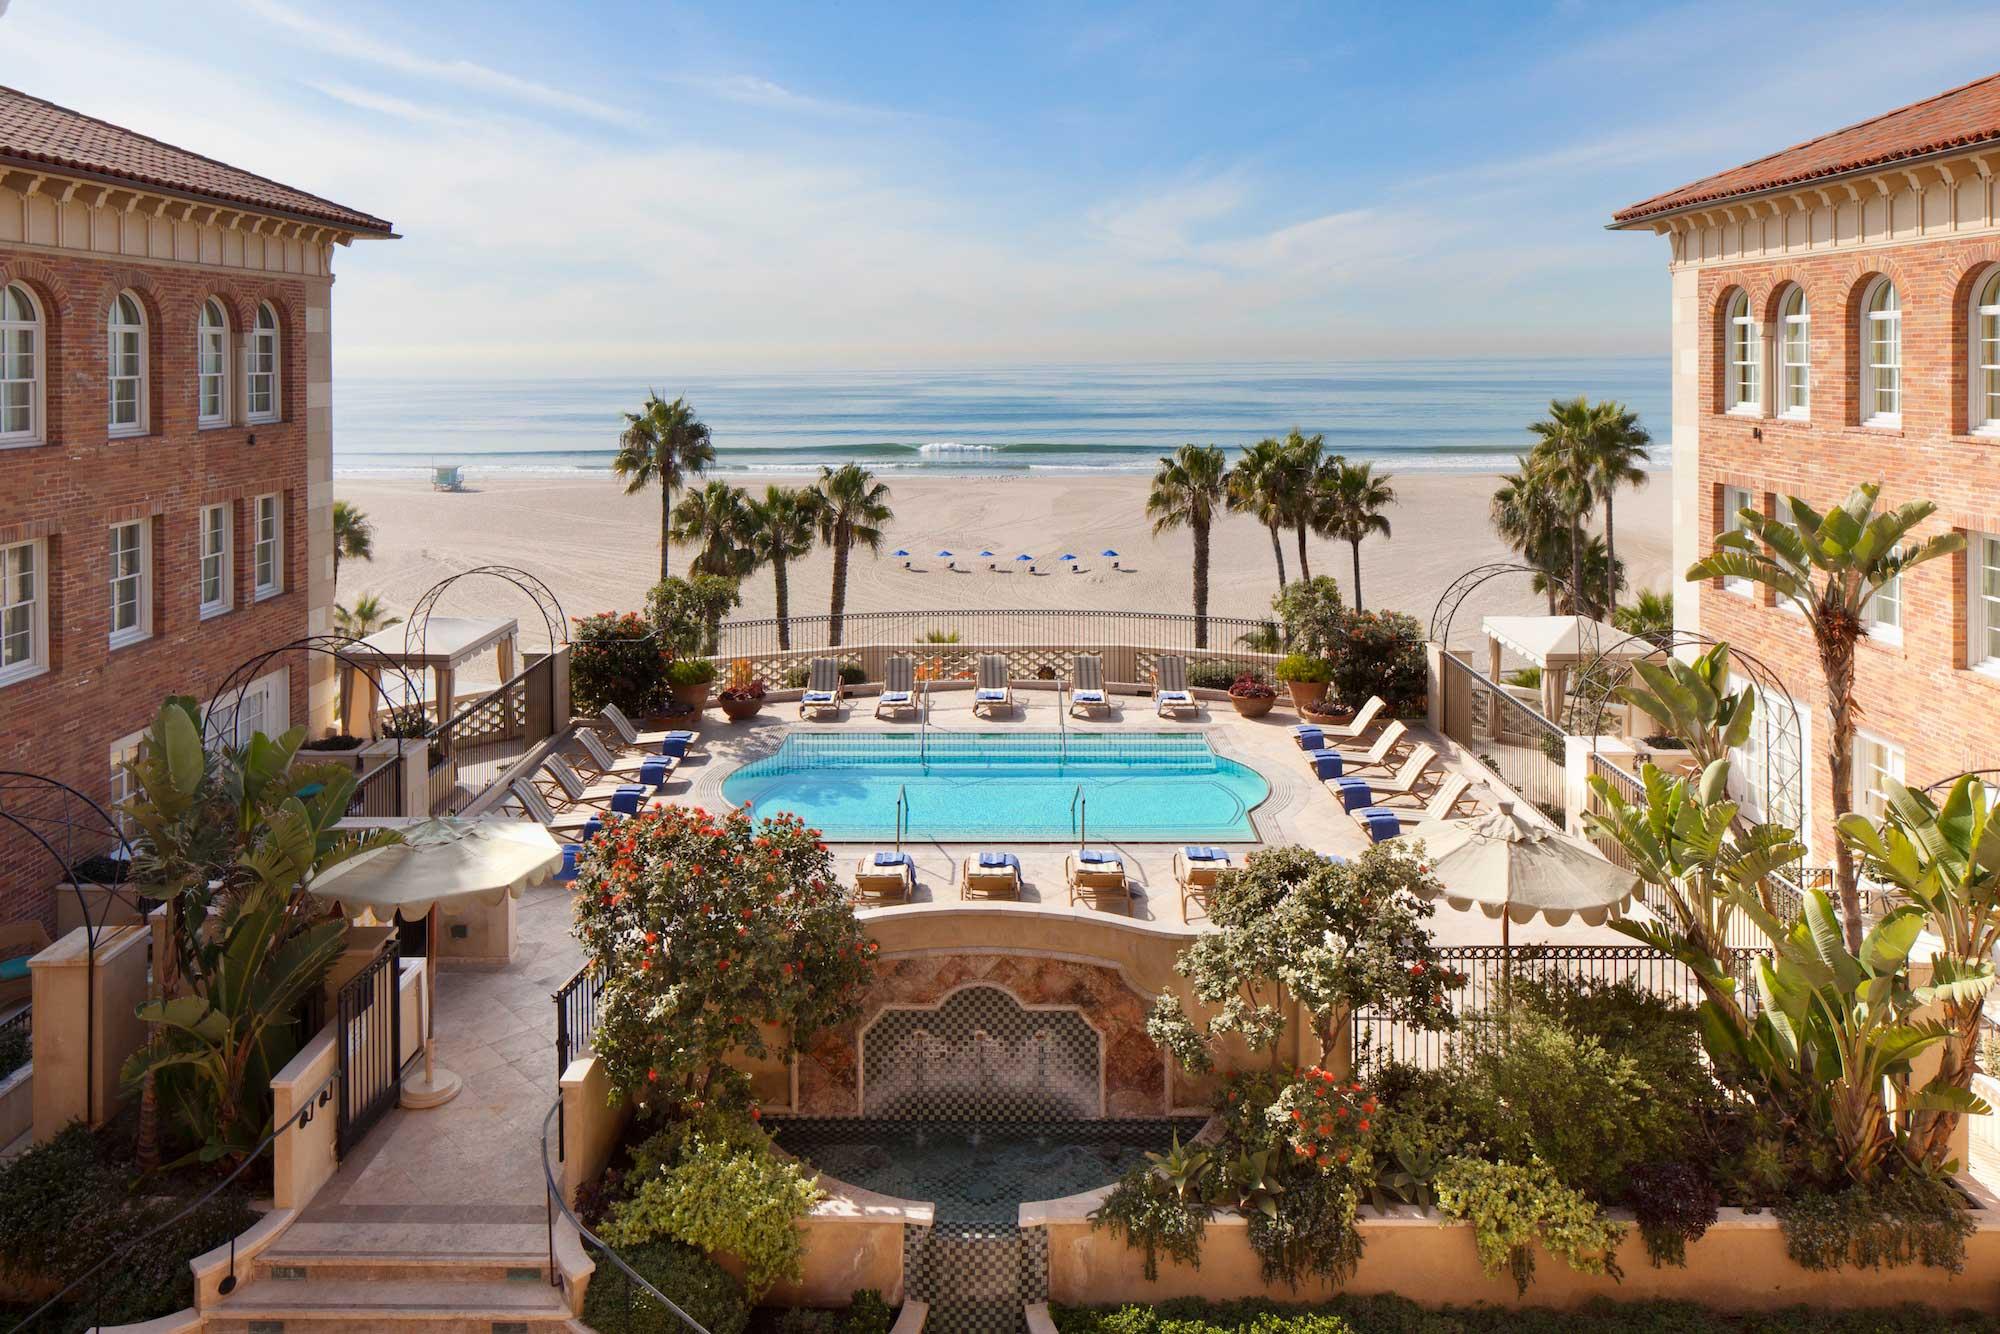 Casa Del Mar pool with view of beach and ocean in Santa Monica